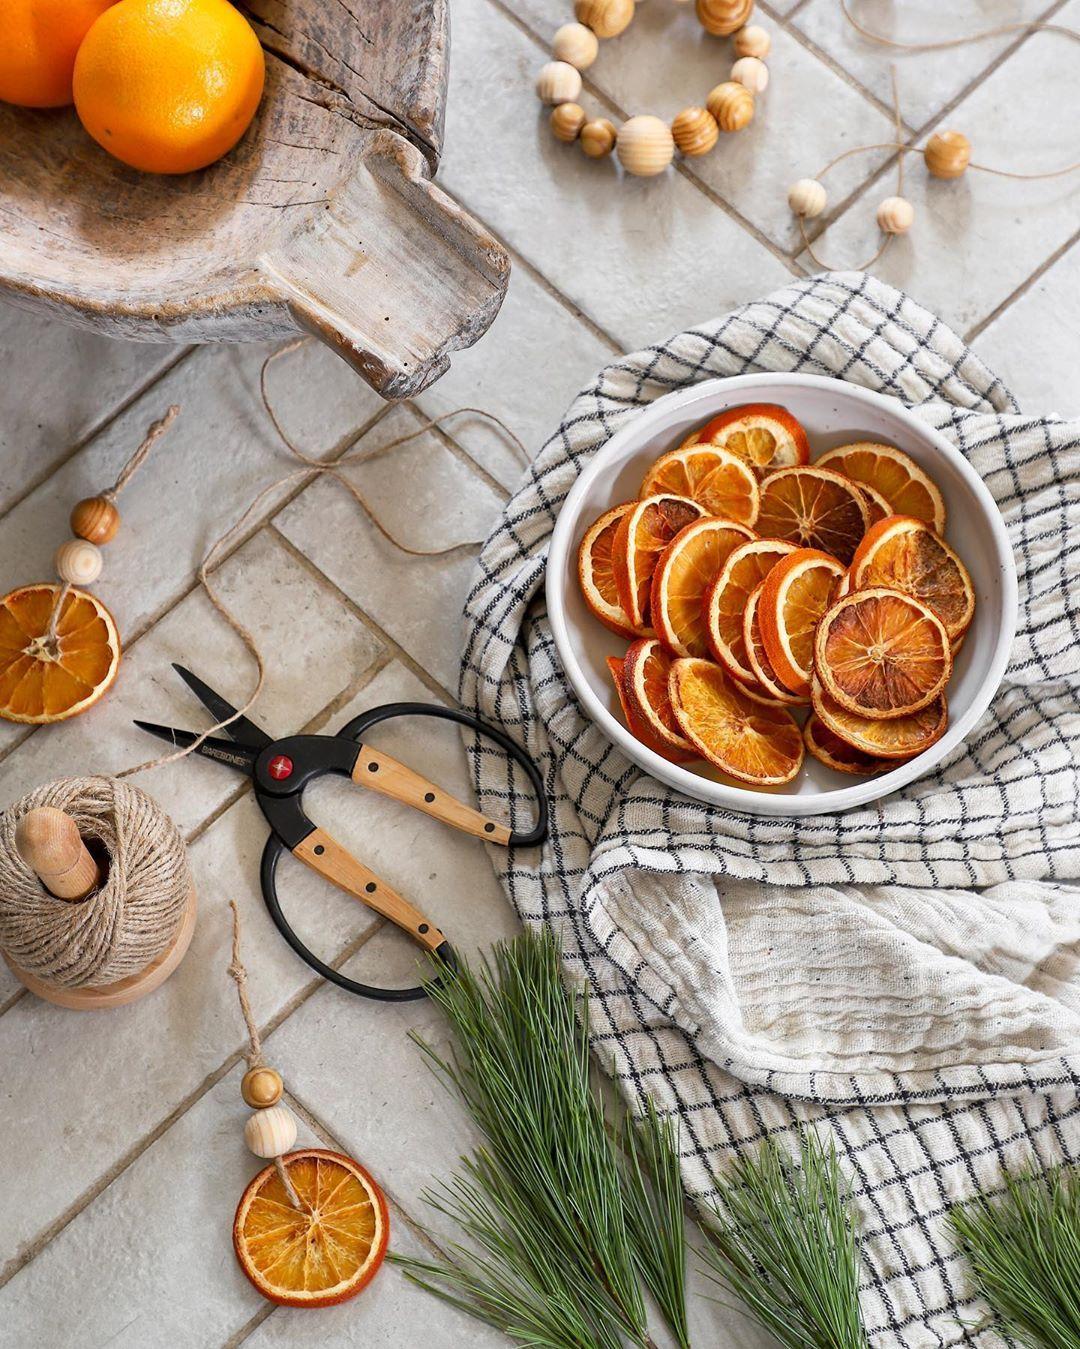 New DIY Tutorial Post! Dried Orange & Wood Ornaments, plus